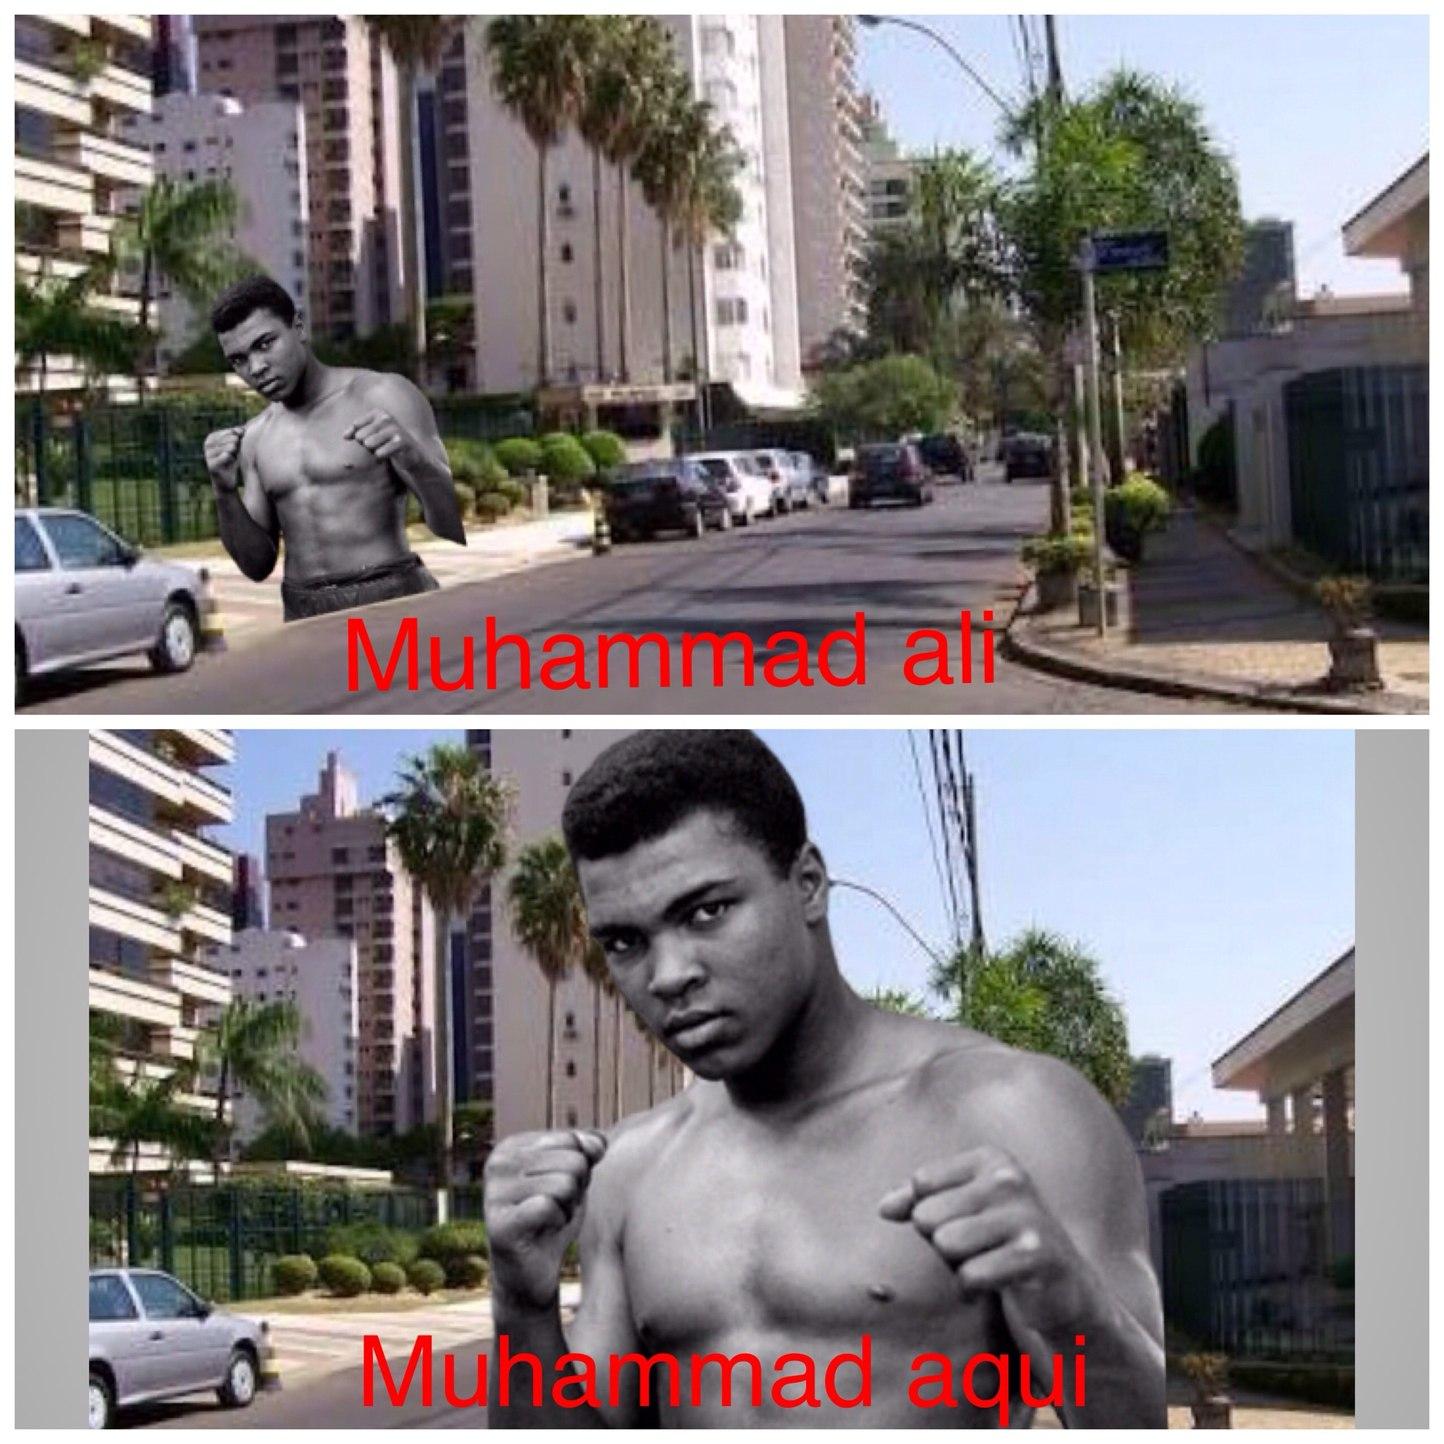 muhammad ali - meme